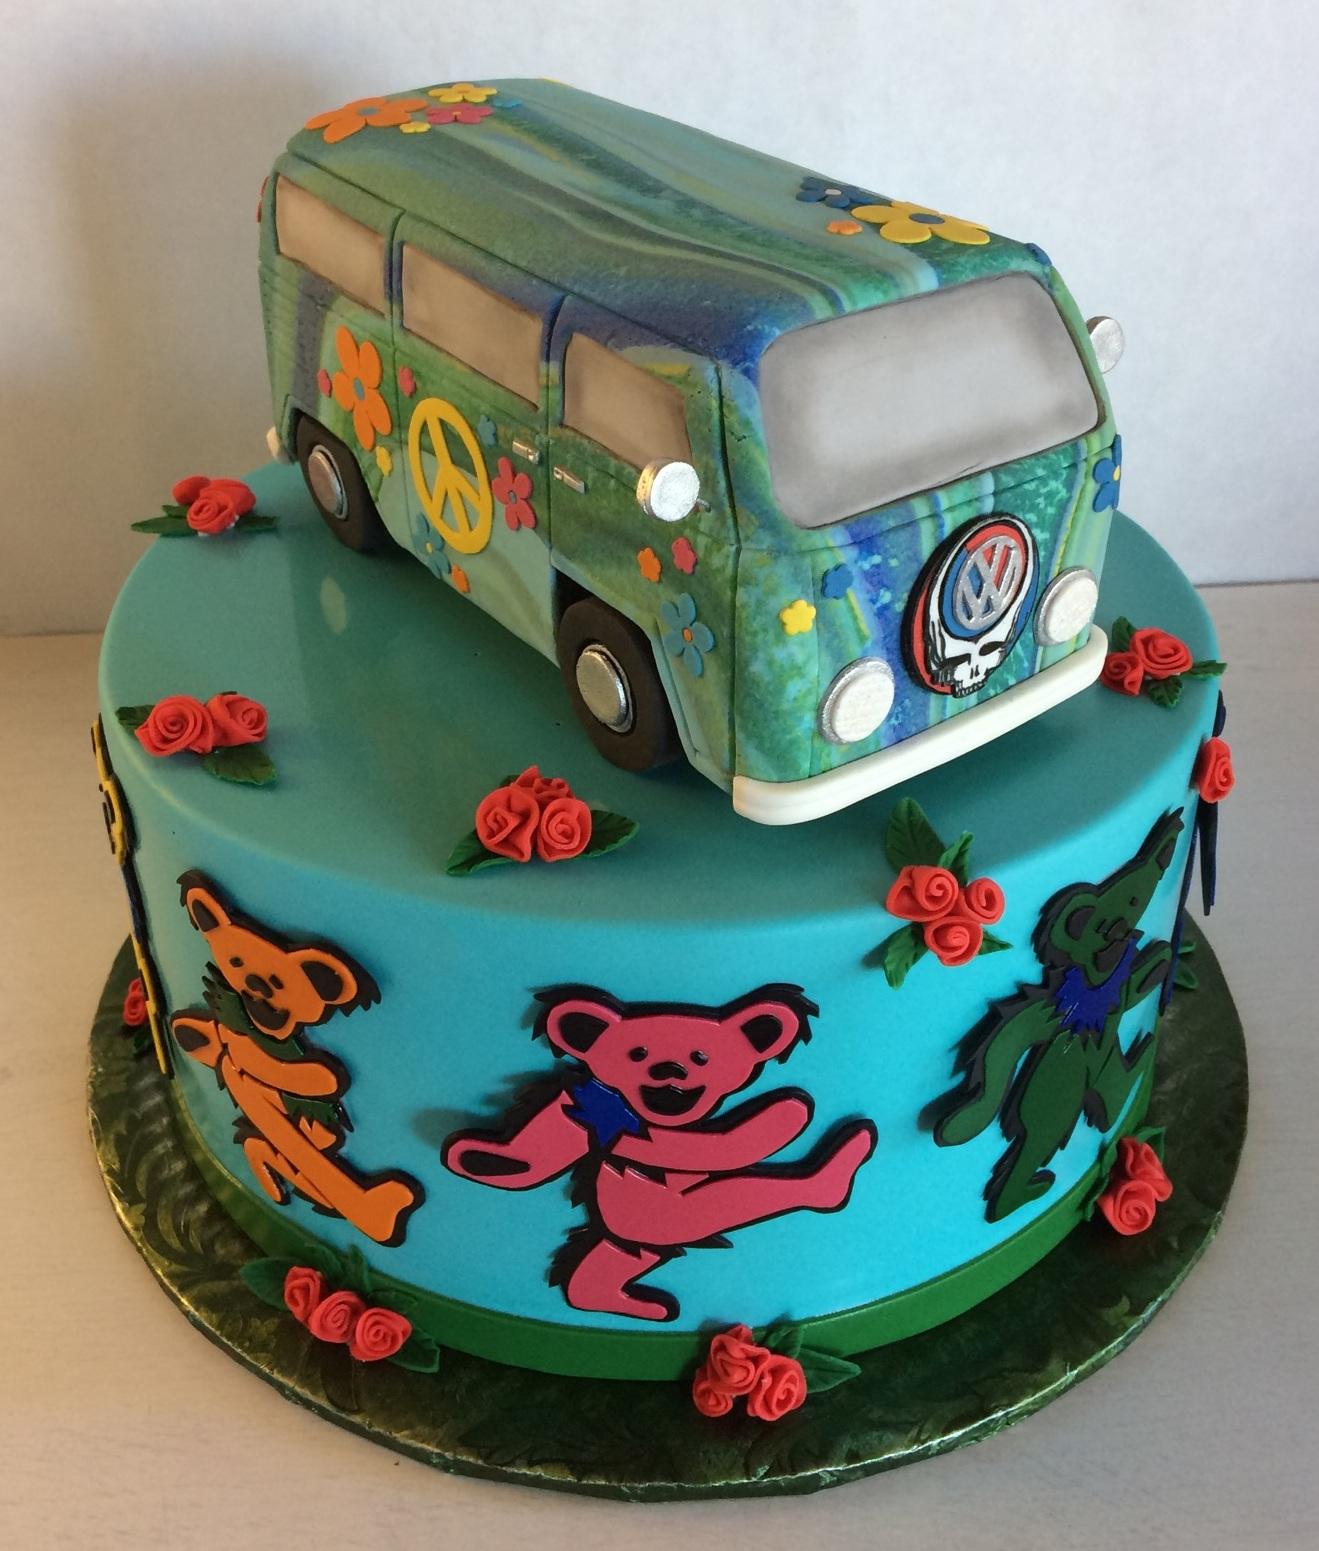 Custom Cakes Wedding And Baked